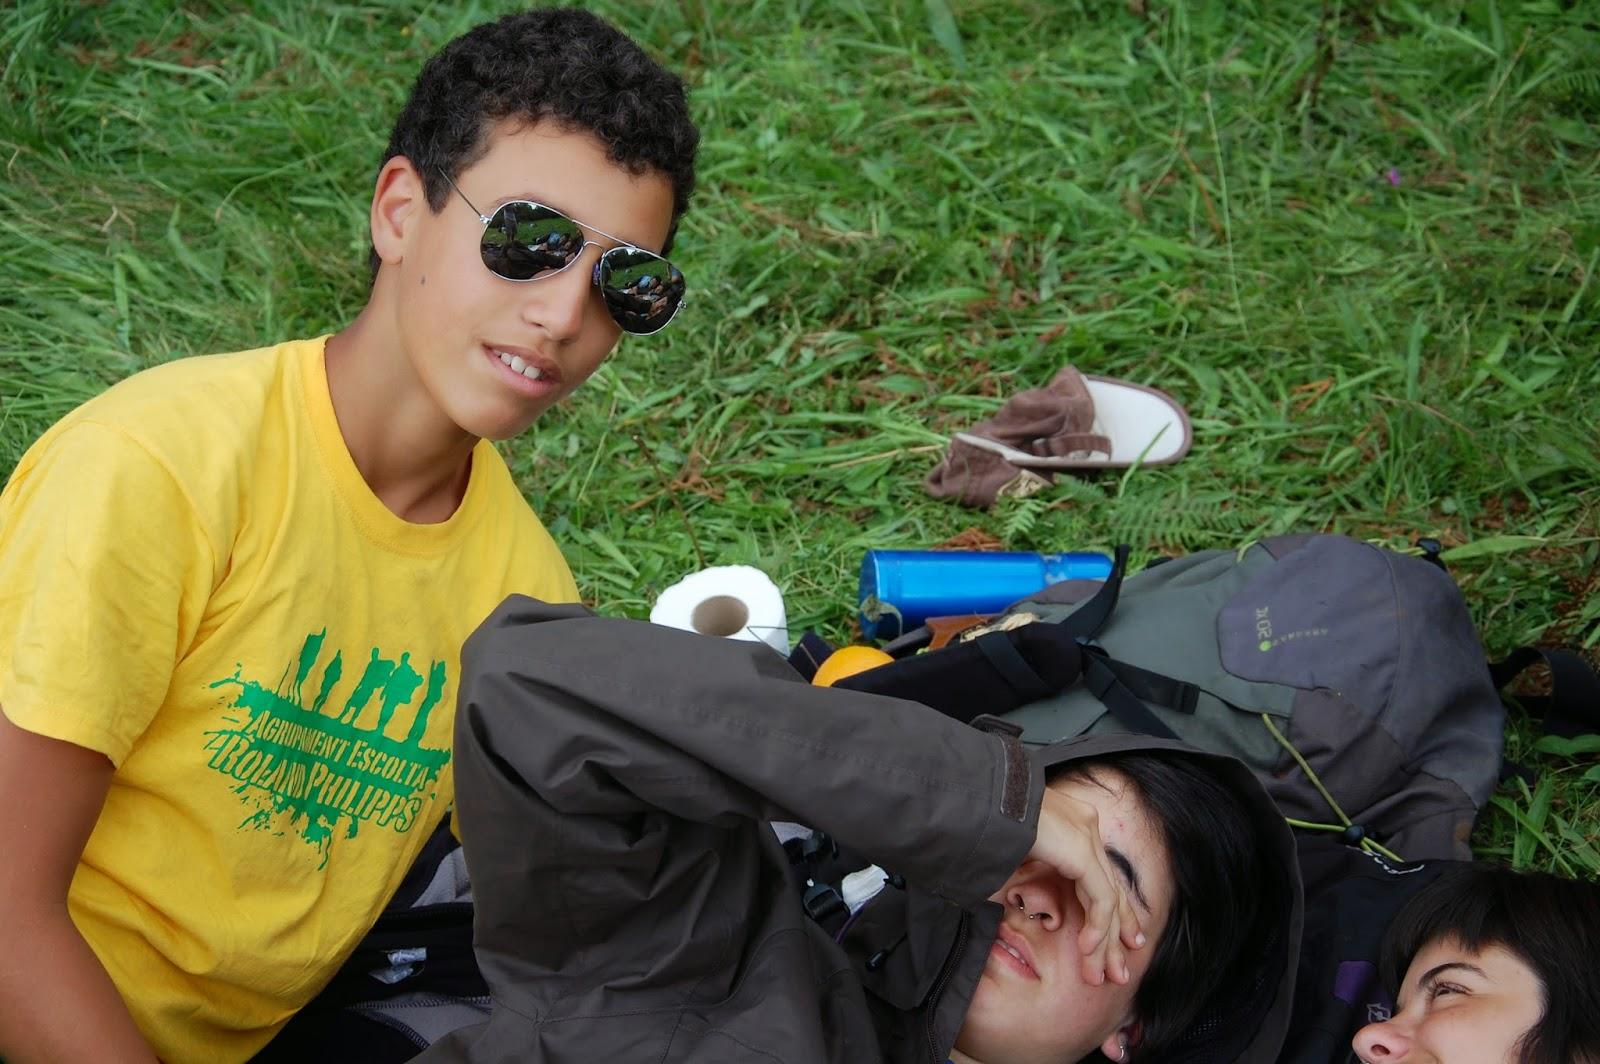 Campaments Estiu RolandKing 2011 - DSC_0101%2B2.JPG